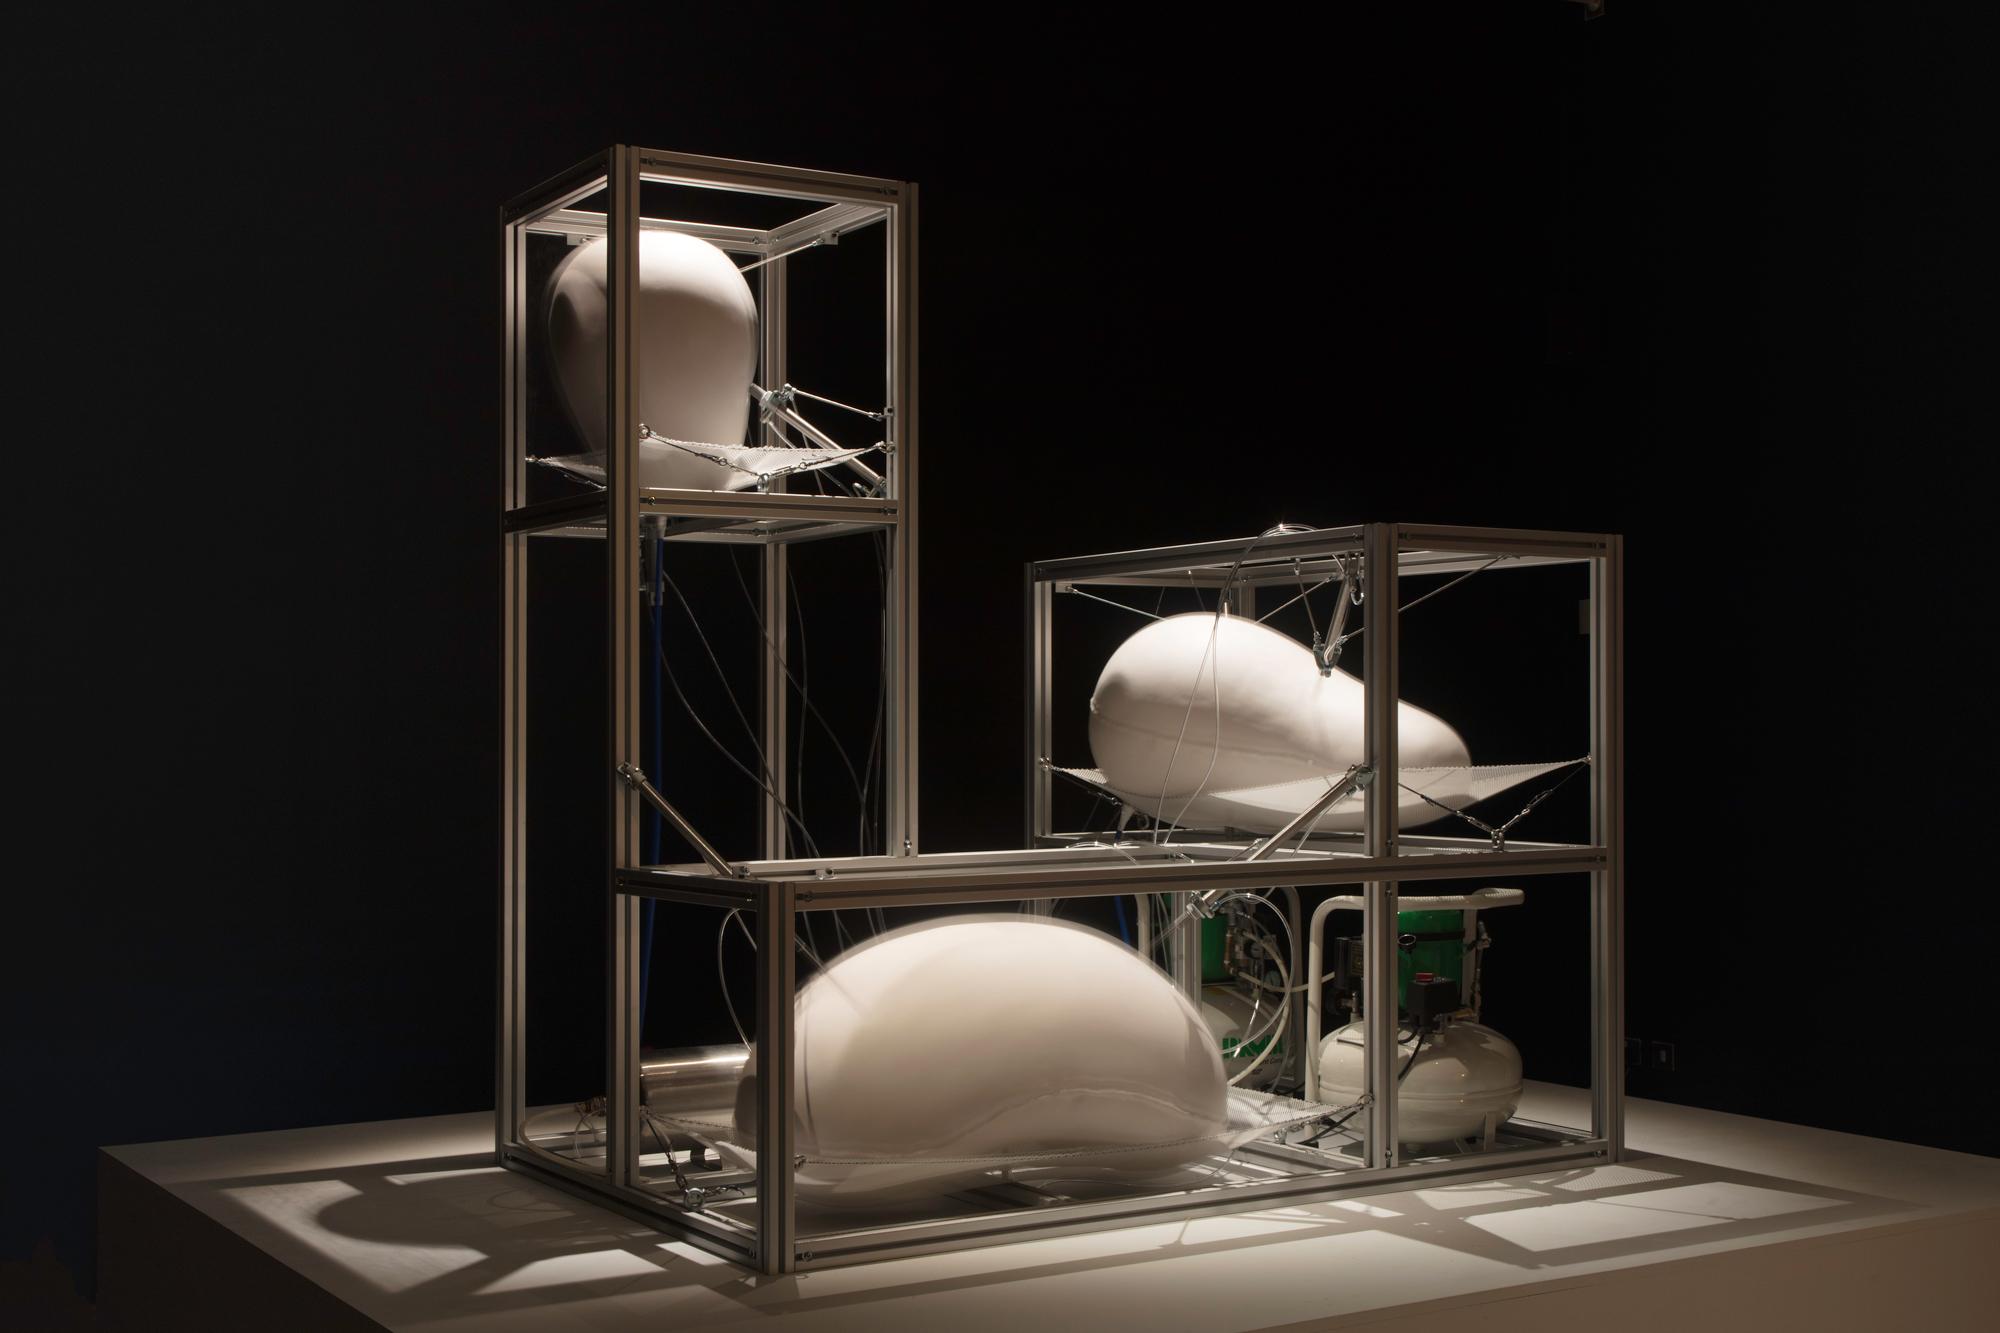 Harrison Pearce, Defence Cascade, Silicone, aluminium, pneumatics, 186 x 180 x 120, 2018.jpg